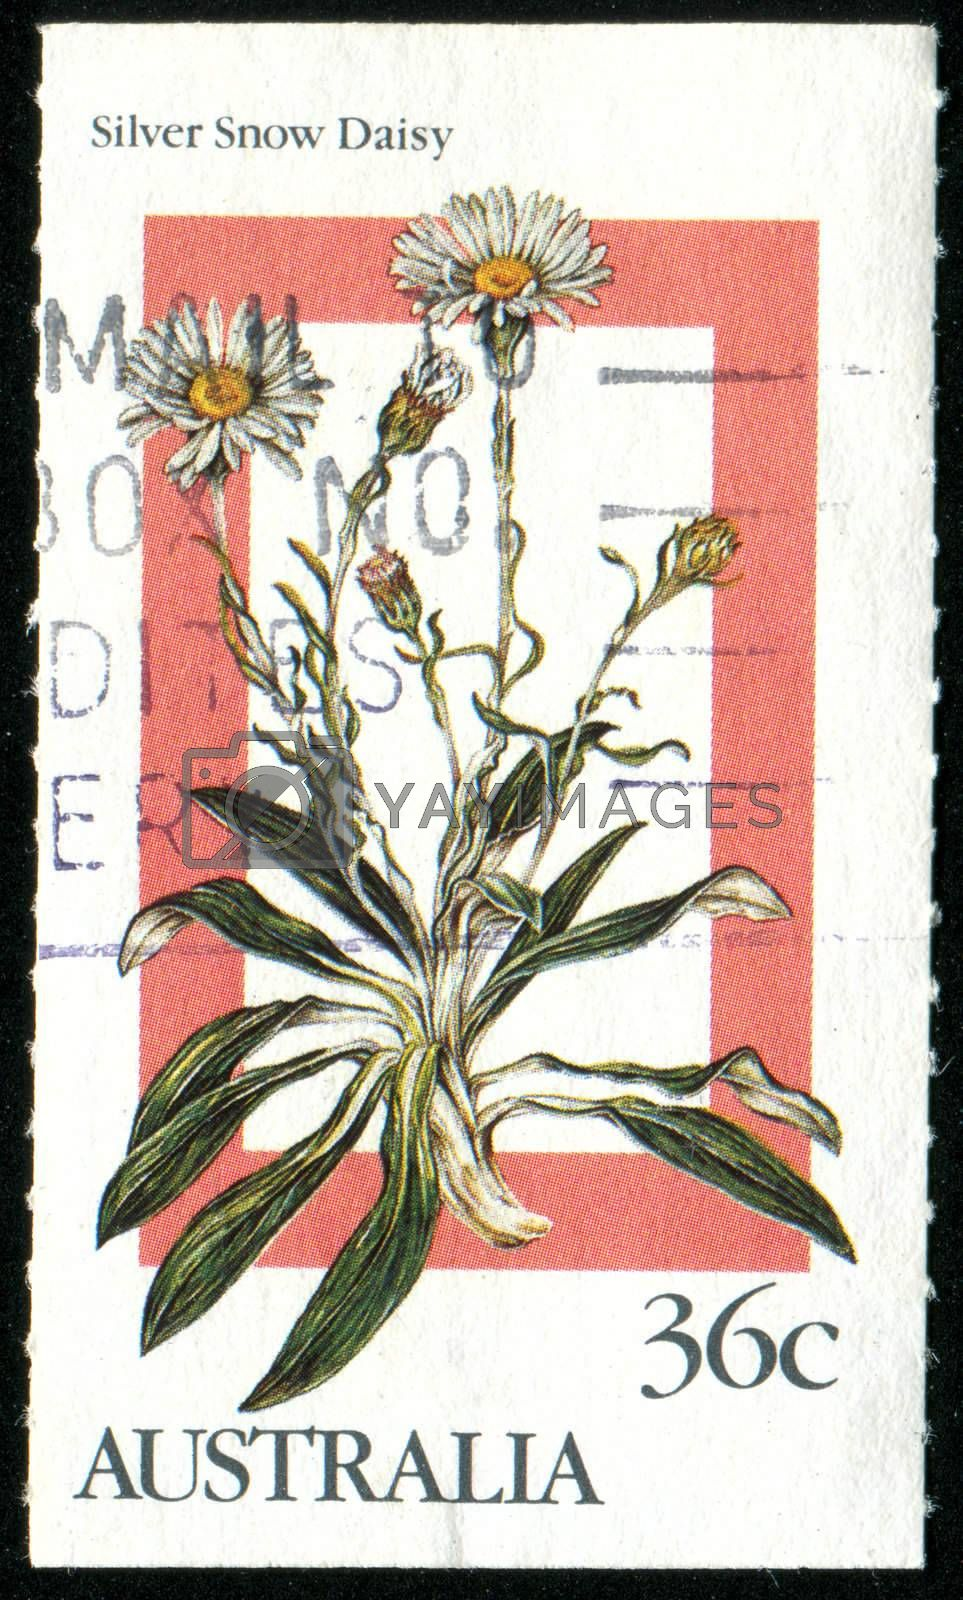 AUSTRALIA - CIRCA 1986: stamp printed by Australia, shows Silver snow daisy, circa 1986